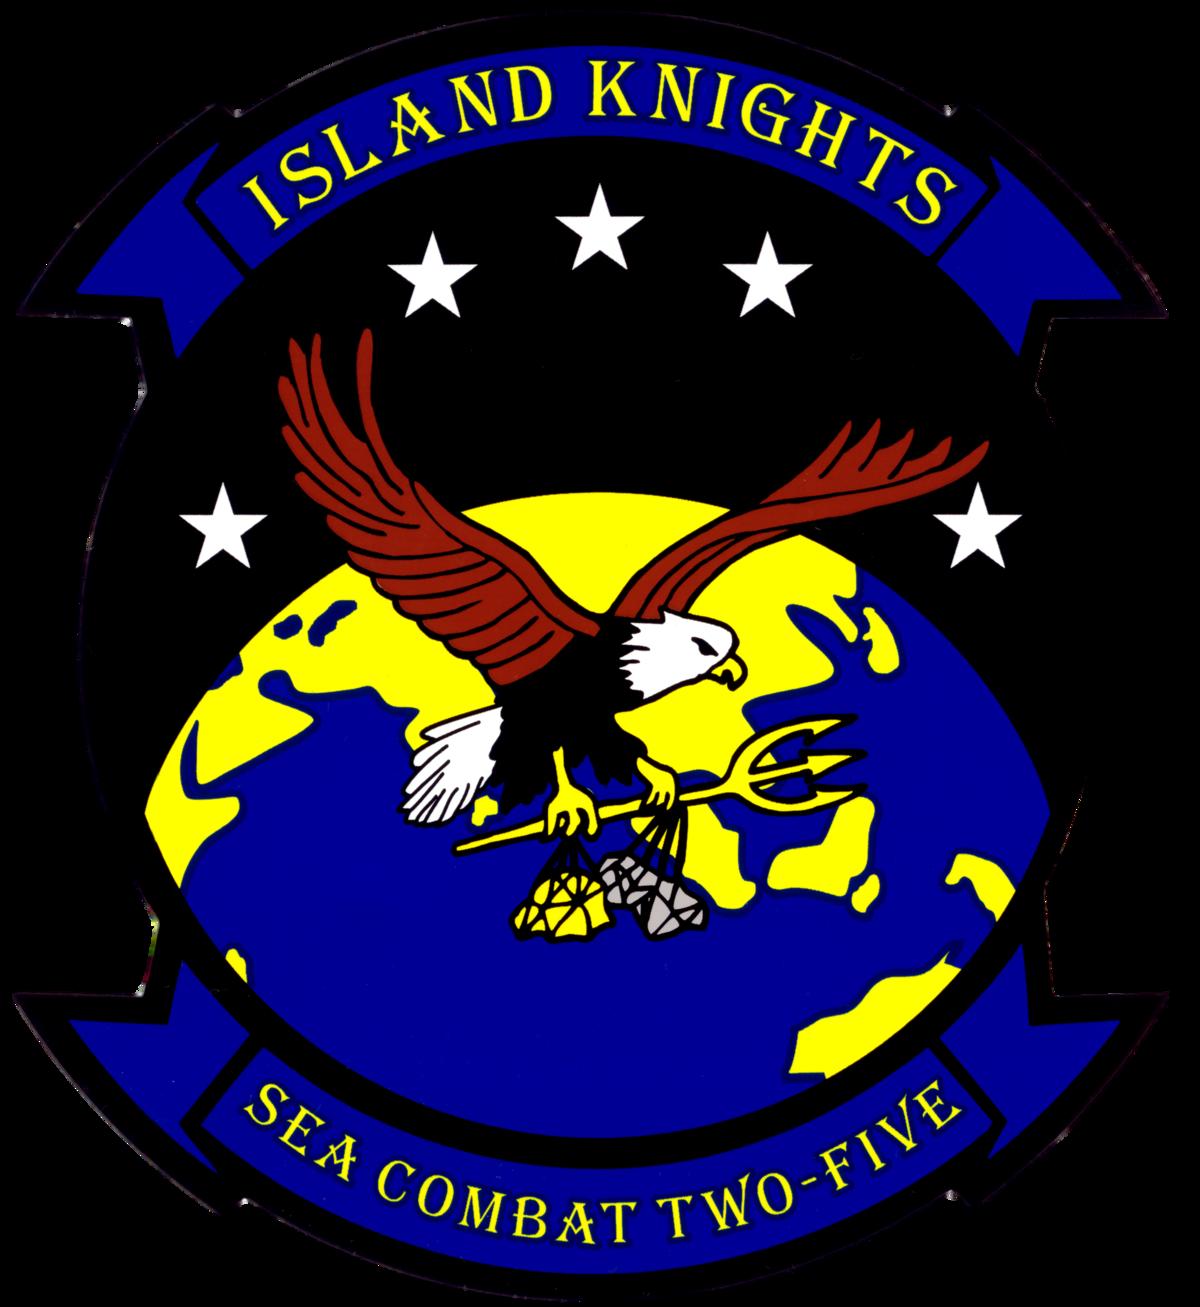 Hsc wikipedia . Navy clipart sailor us navy